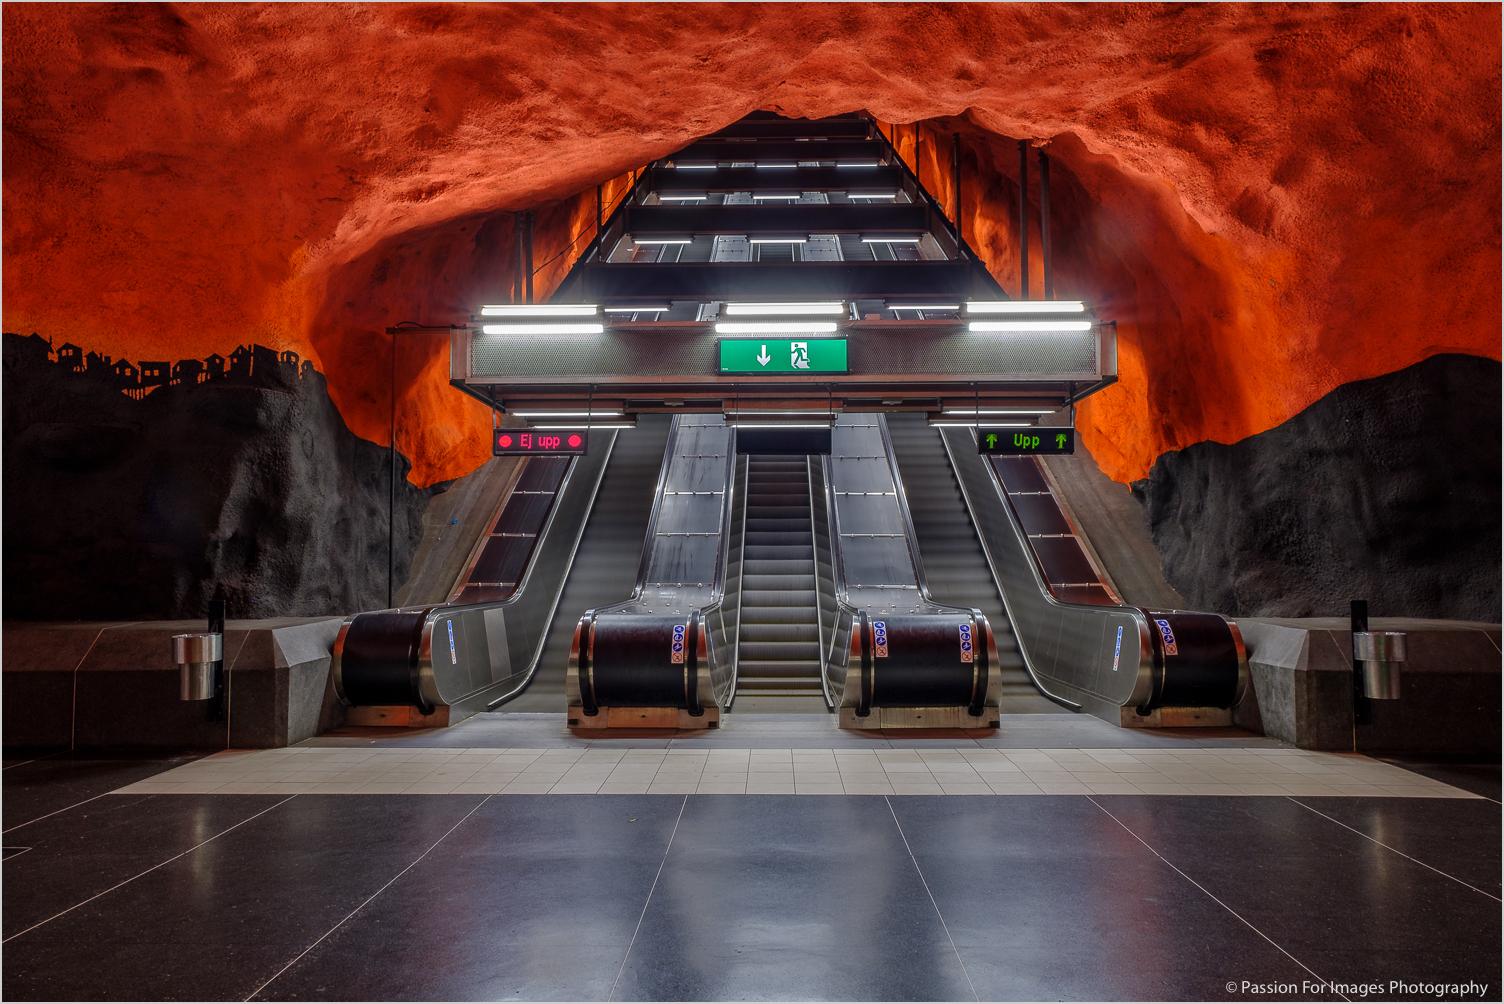 DSCF8823_2019_08_Skandinavien-Edit-Subway-Stockholm-Art-Project.jpg